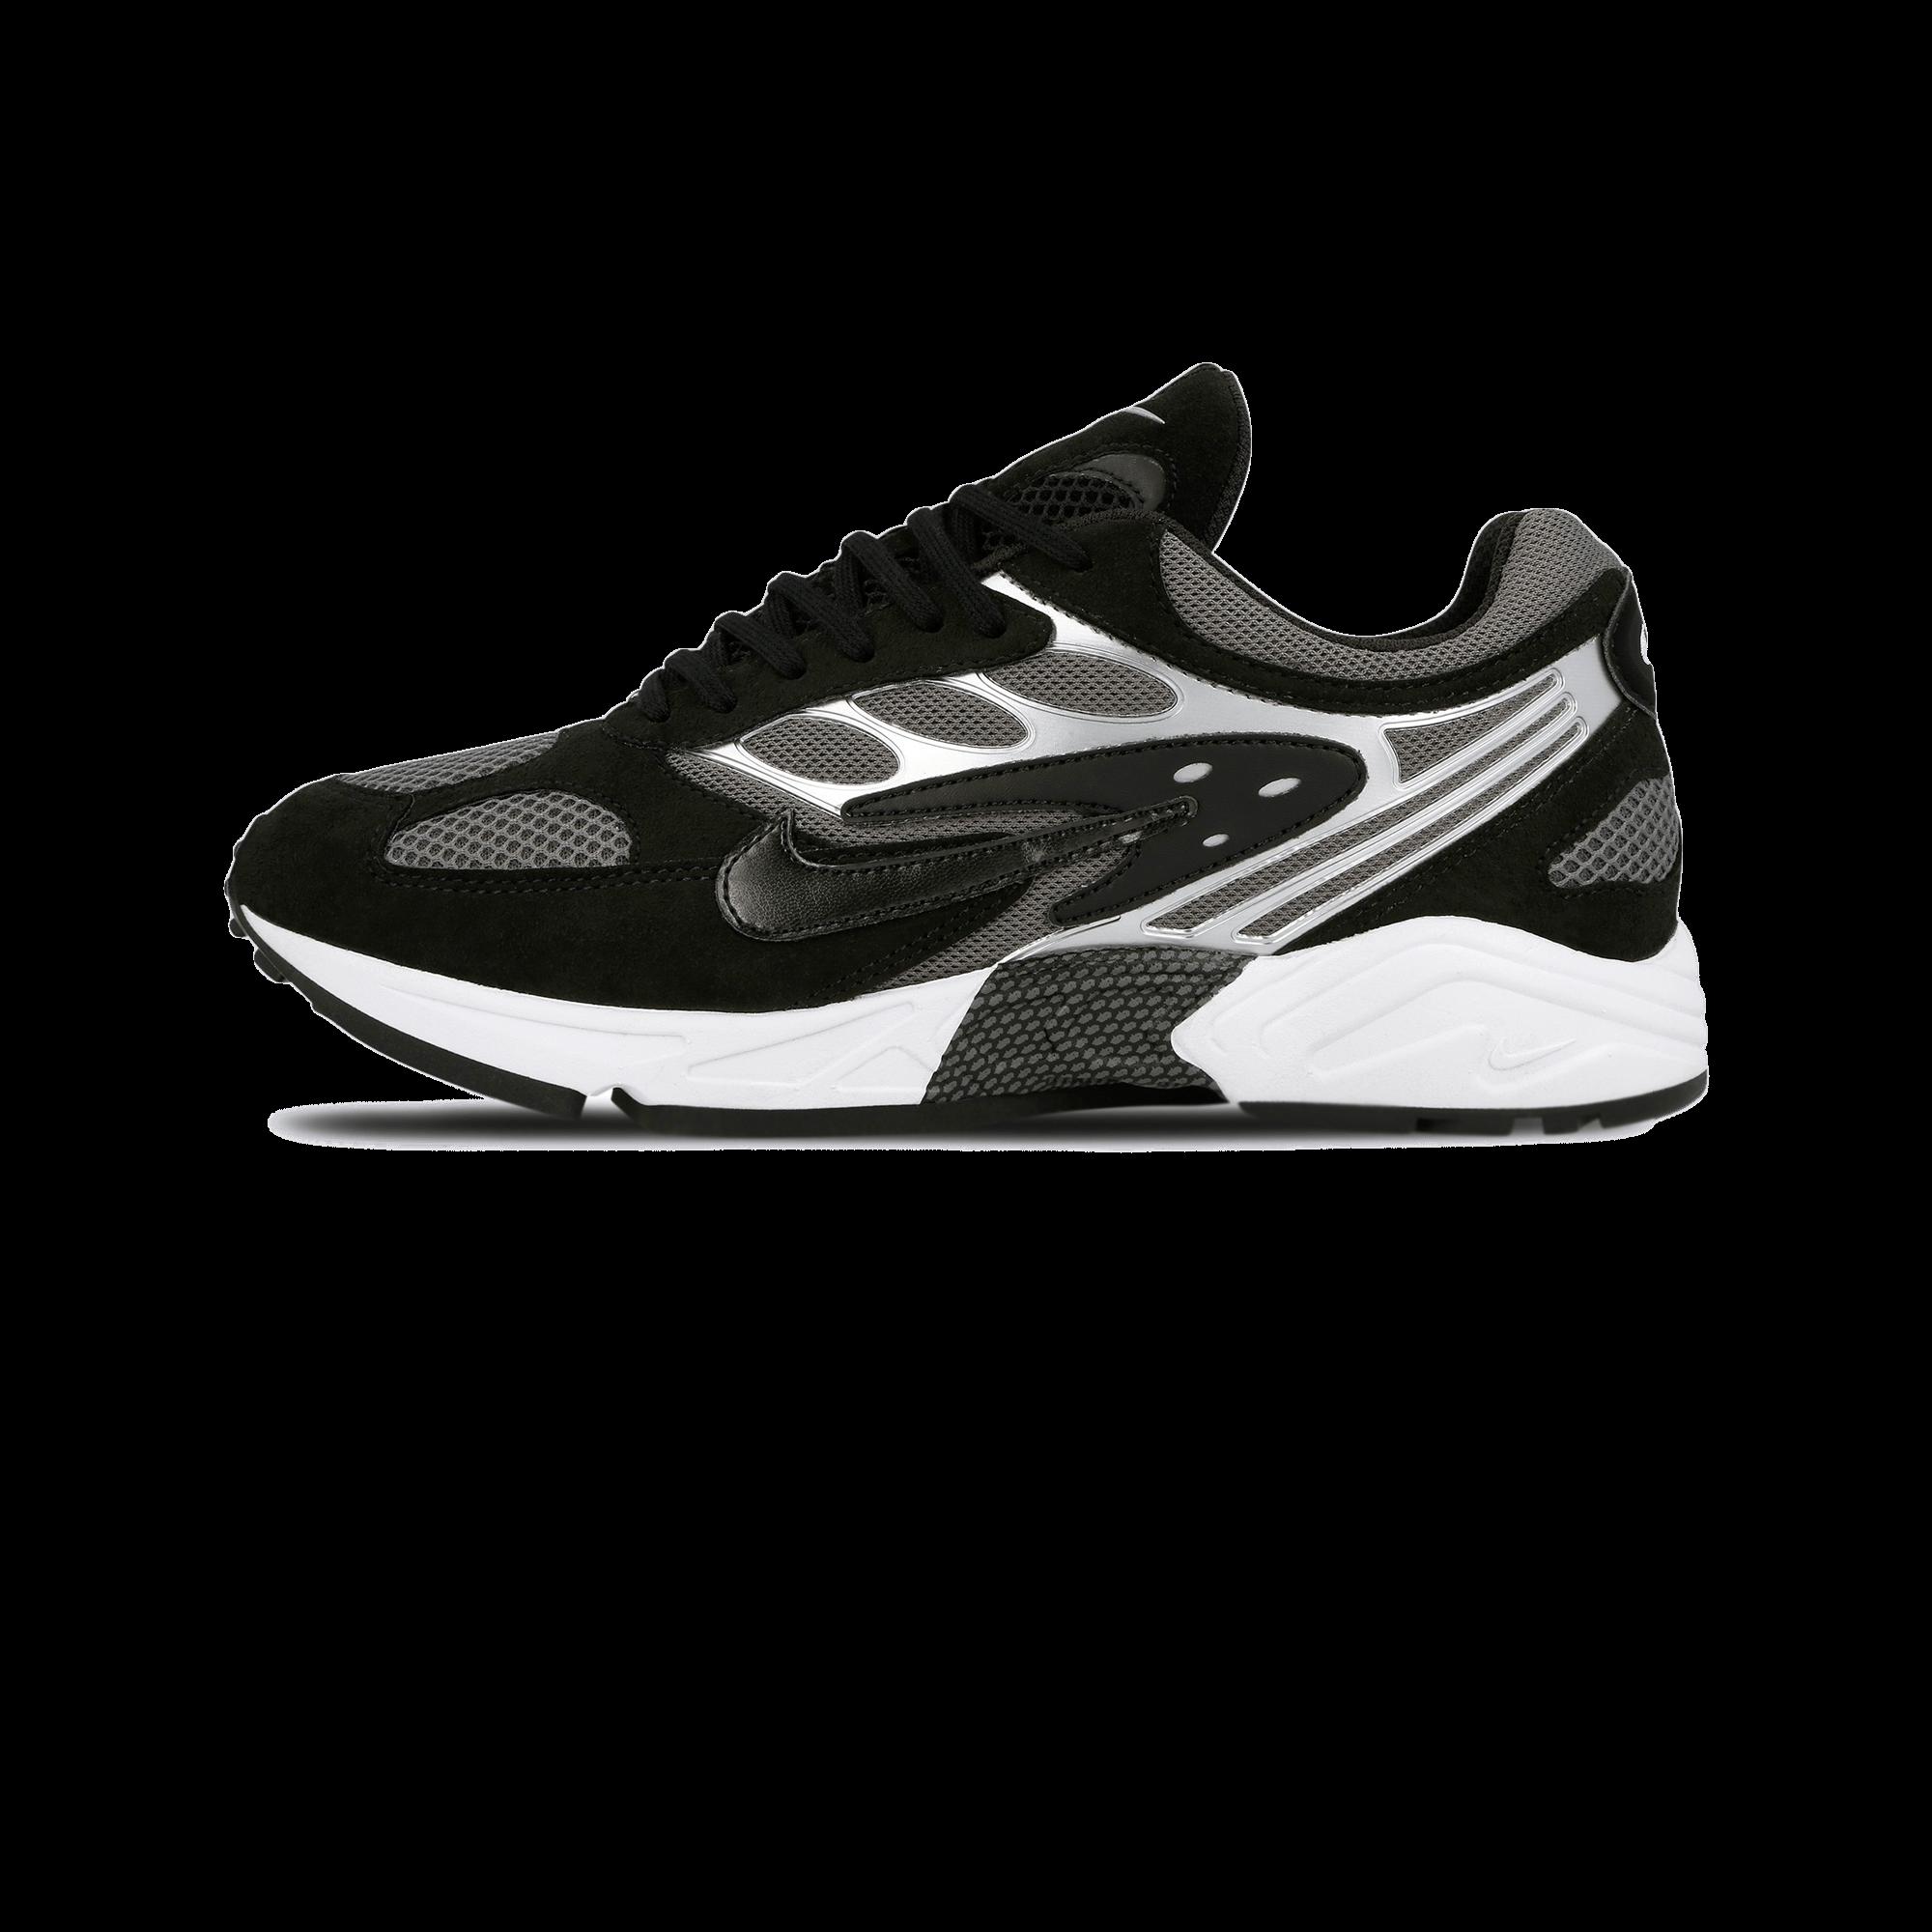 NIKE Kie Ney AMAX sneakers Lady's AIR MAX 90 MESH GS Air Max 90 mesh 724,824 100 shoes white